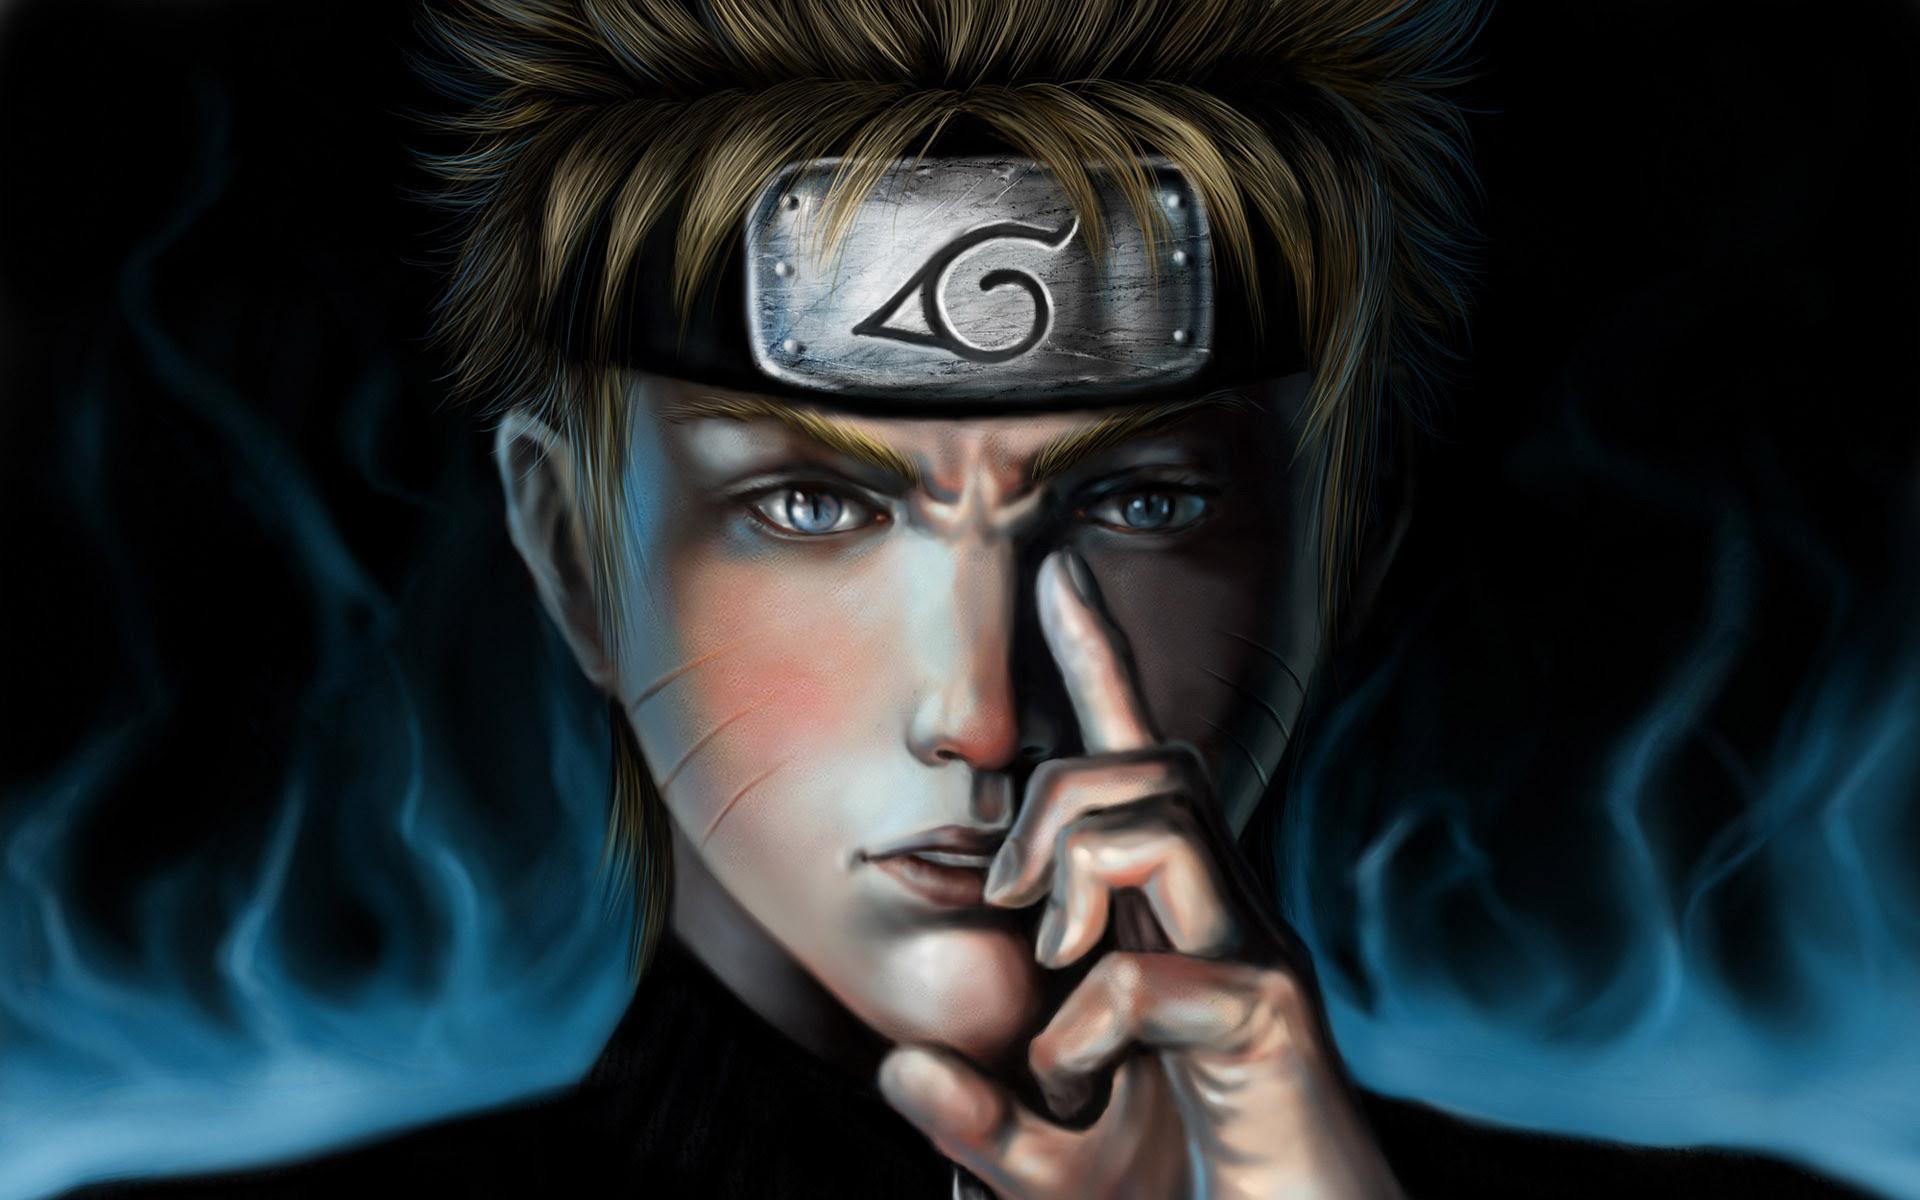 Unduh 98+ Wallpaper Naruto 3d Hd Terbaik